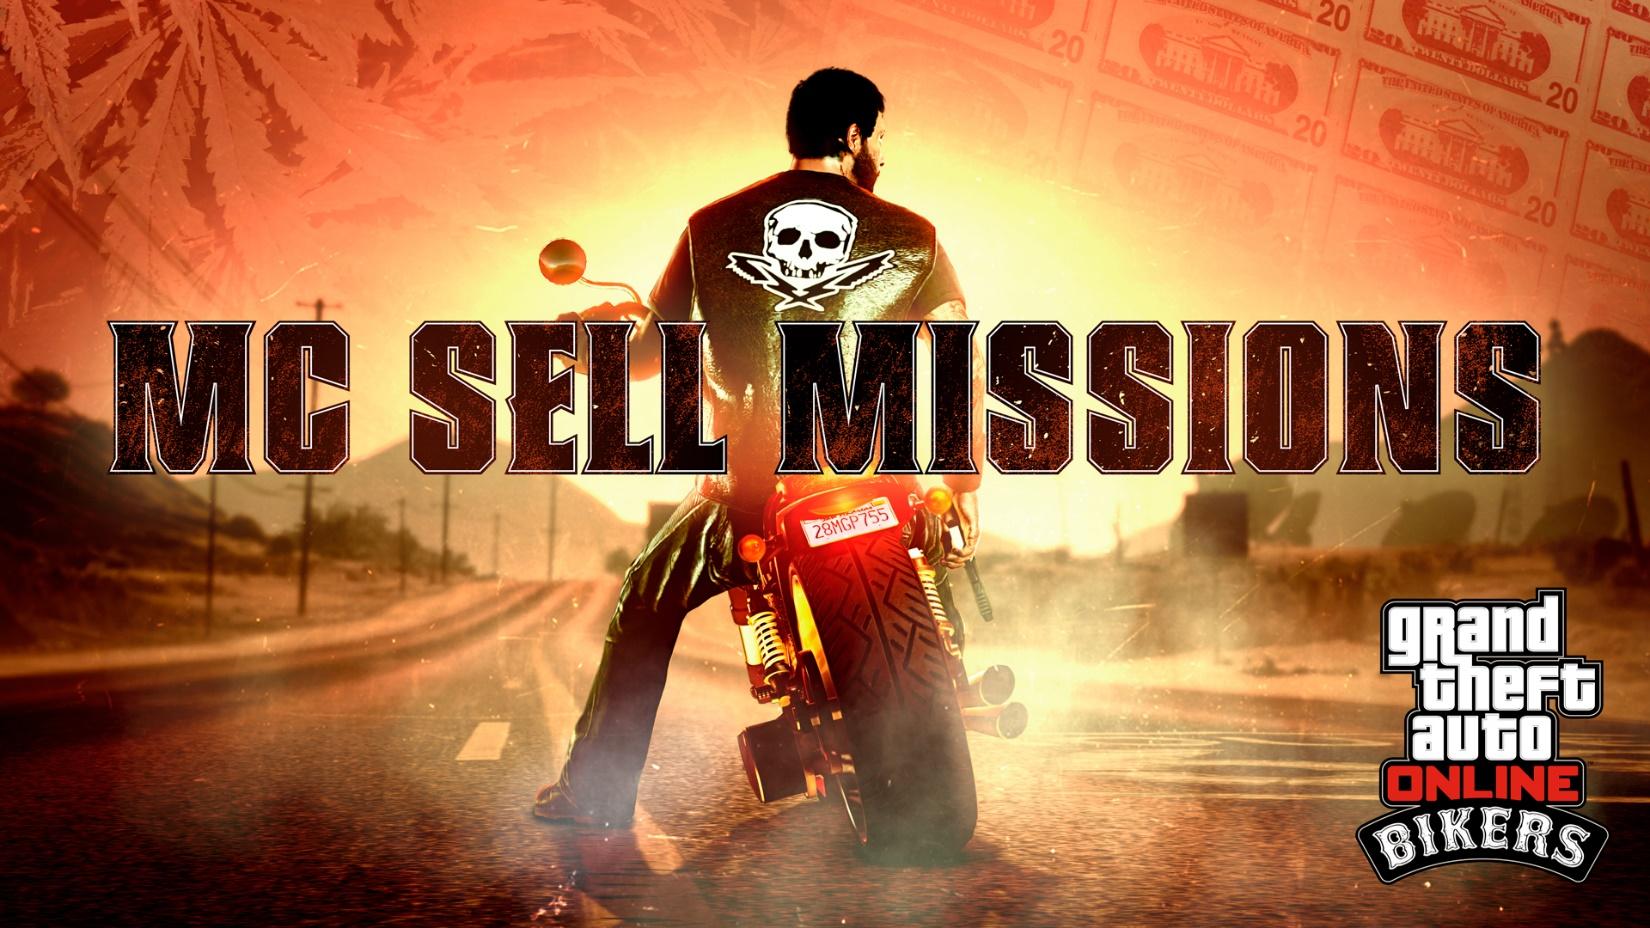 GTA Online: GTA$ doppi e tripl per motociclisti